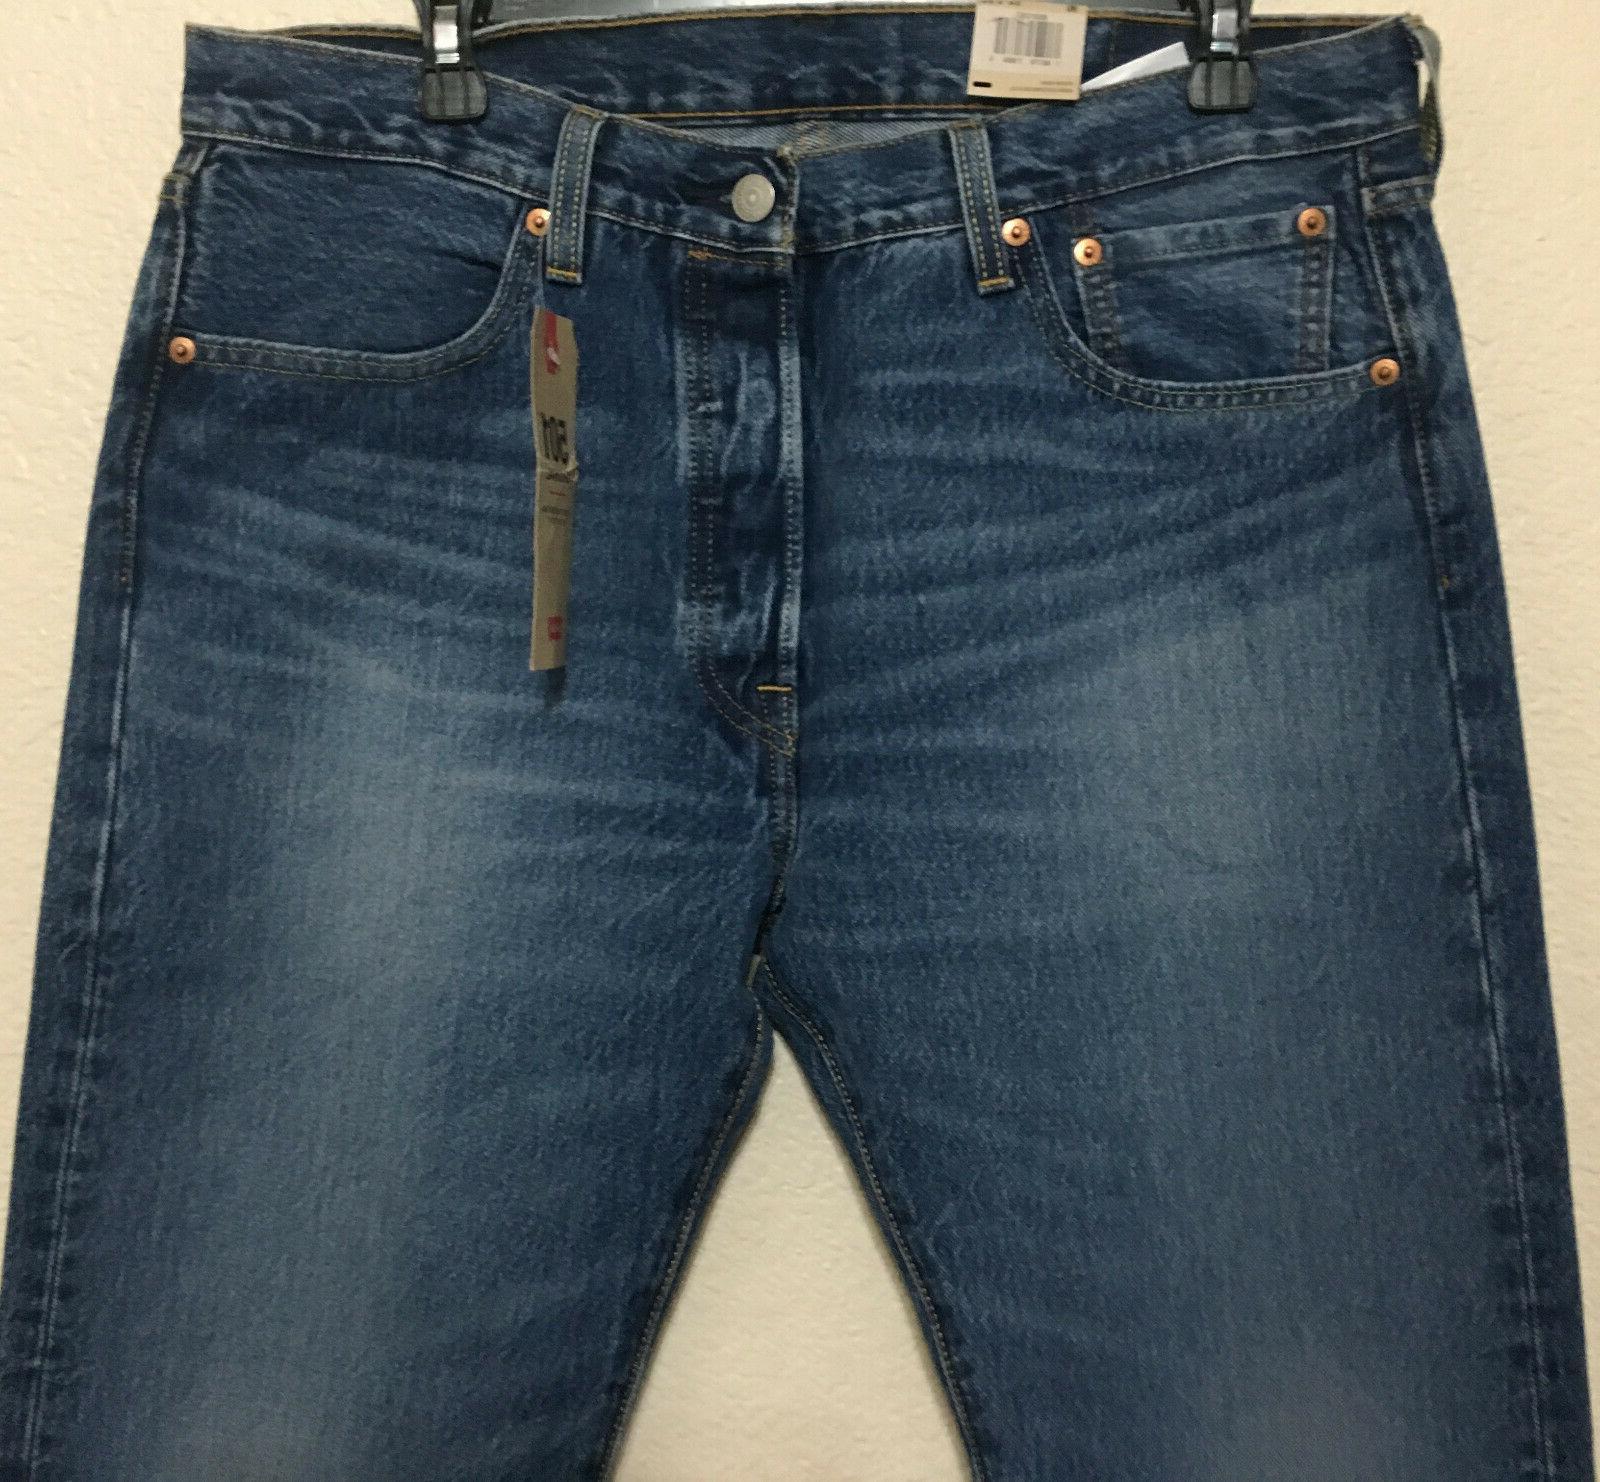 NWT LEVI'S 501 -2487 STRAIGHT BLUE $70